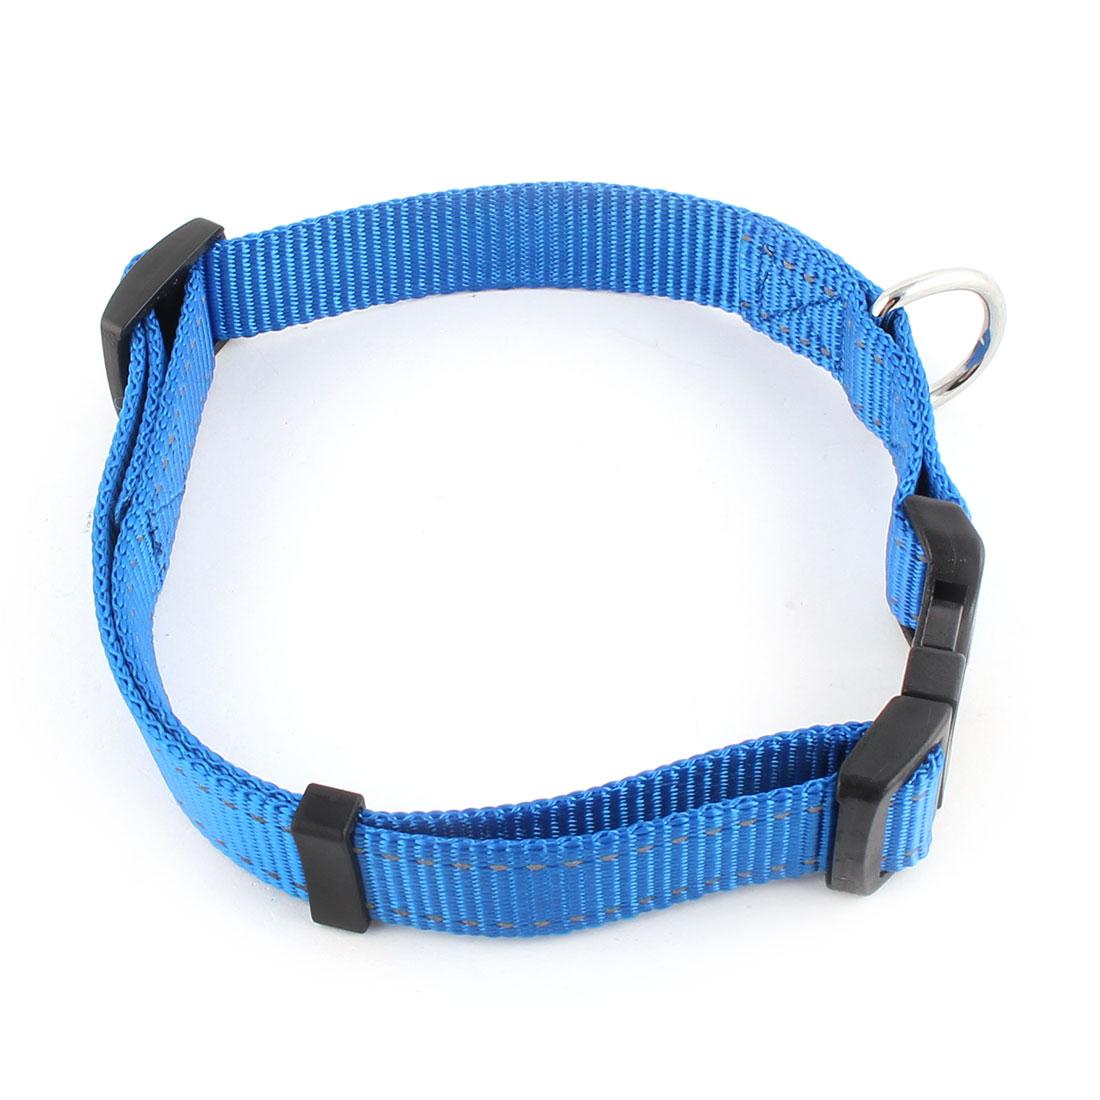 Pet Dog Nylon Adjustable Buckle Strap Reflective Neck Collar Belt Blue